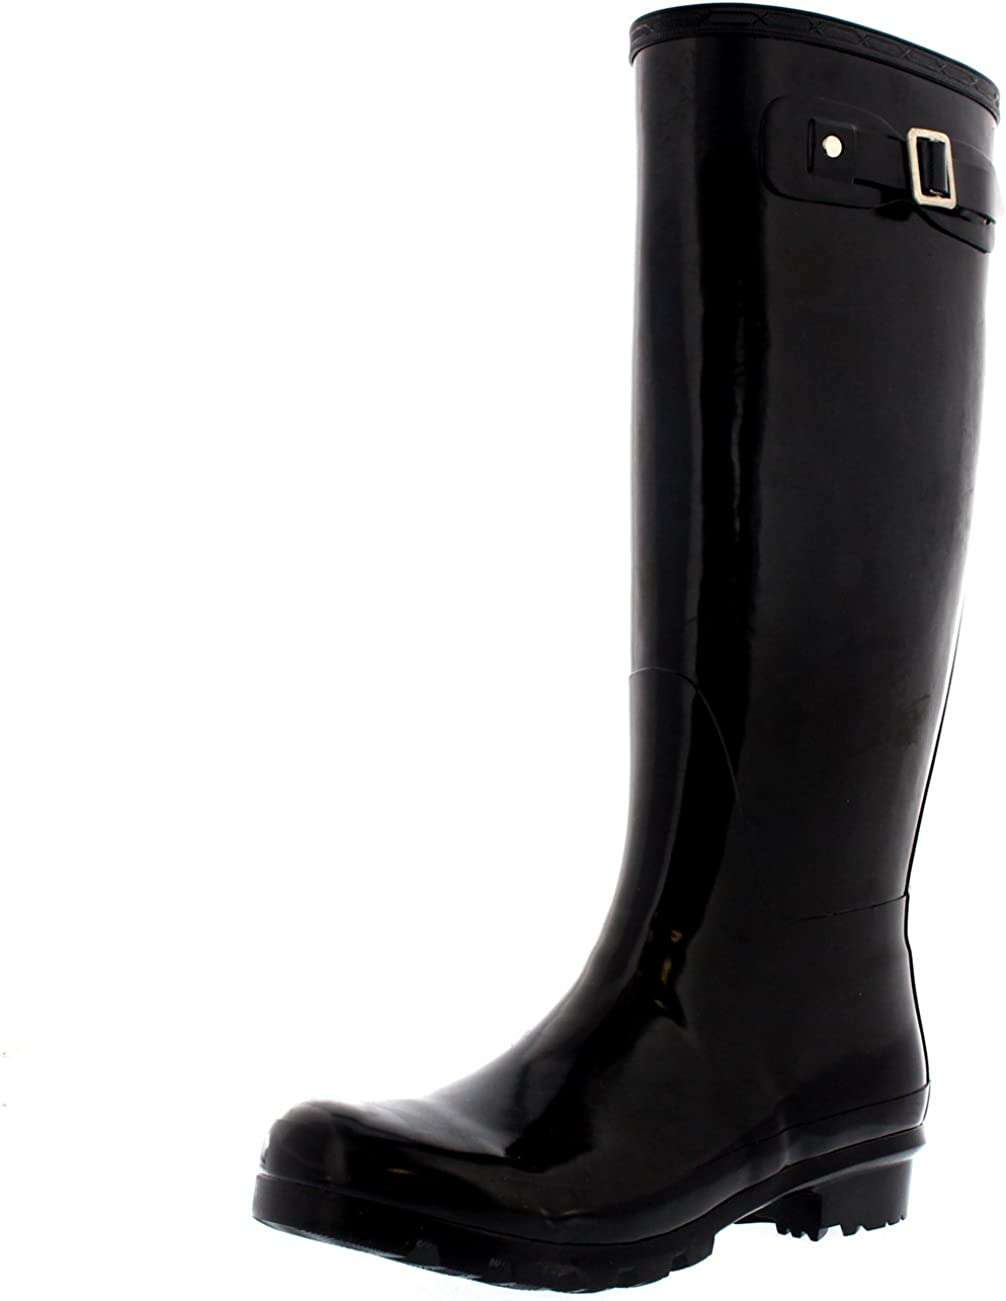 Womens Original Tall Gloss Winter Waterproof Wellies Rain Wellington Boots